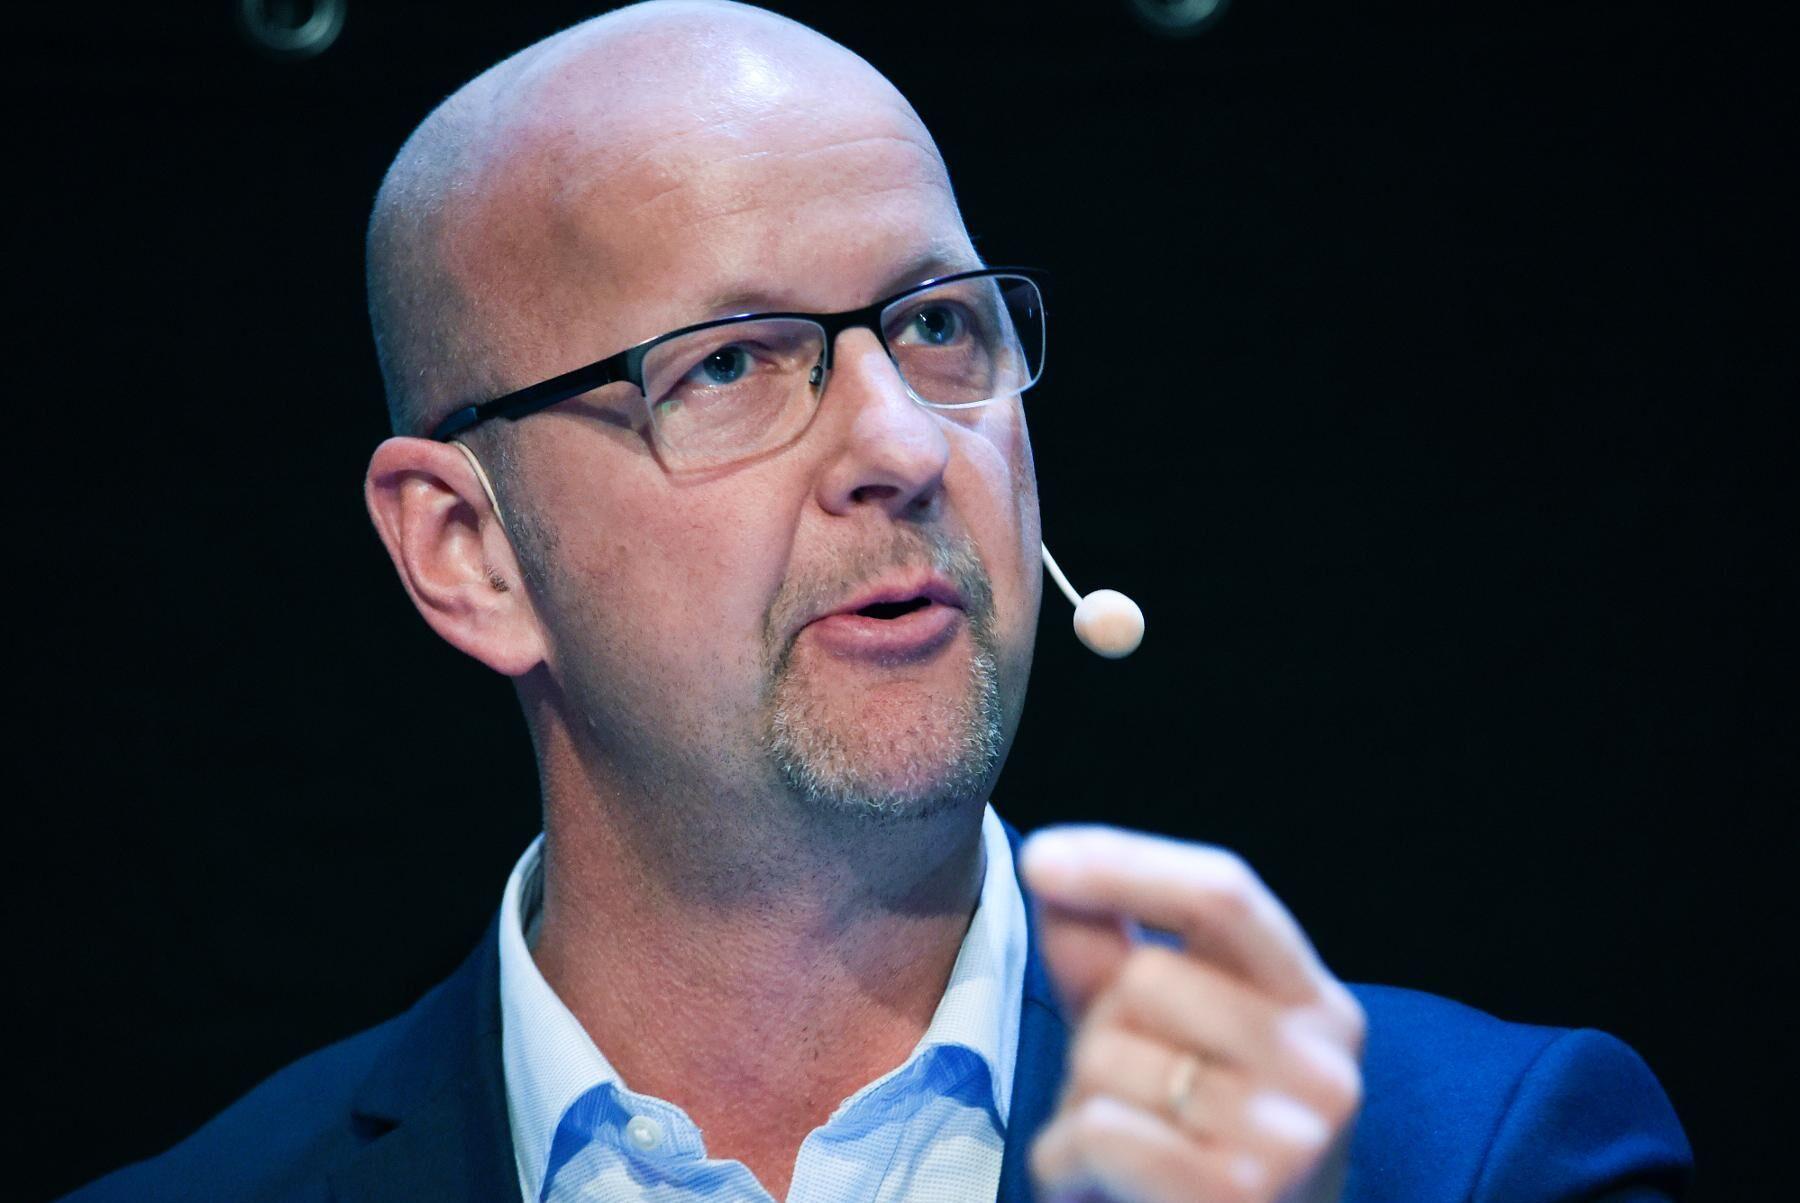 Kristdemokraternas riksdagsledamot Magnus Oscarsson under landsbygdsriksdag 2018.